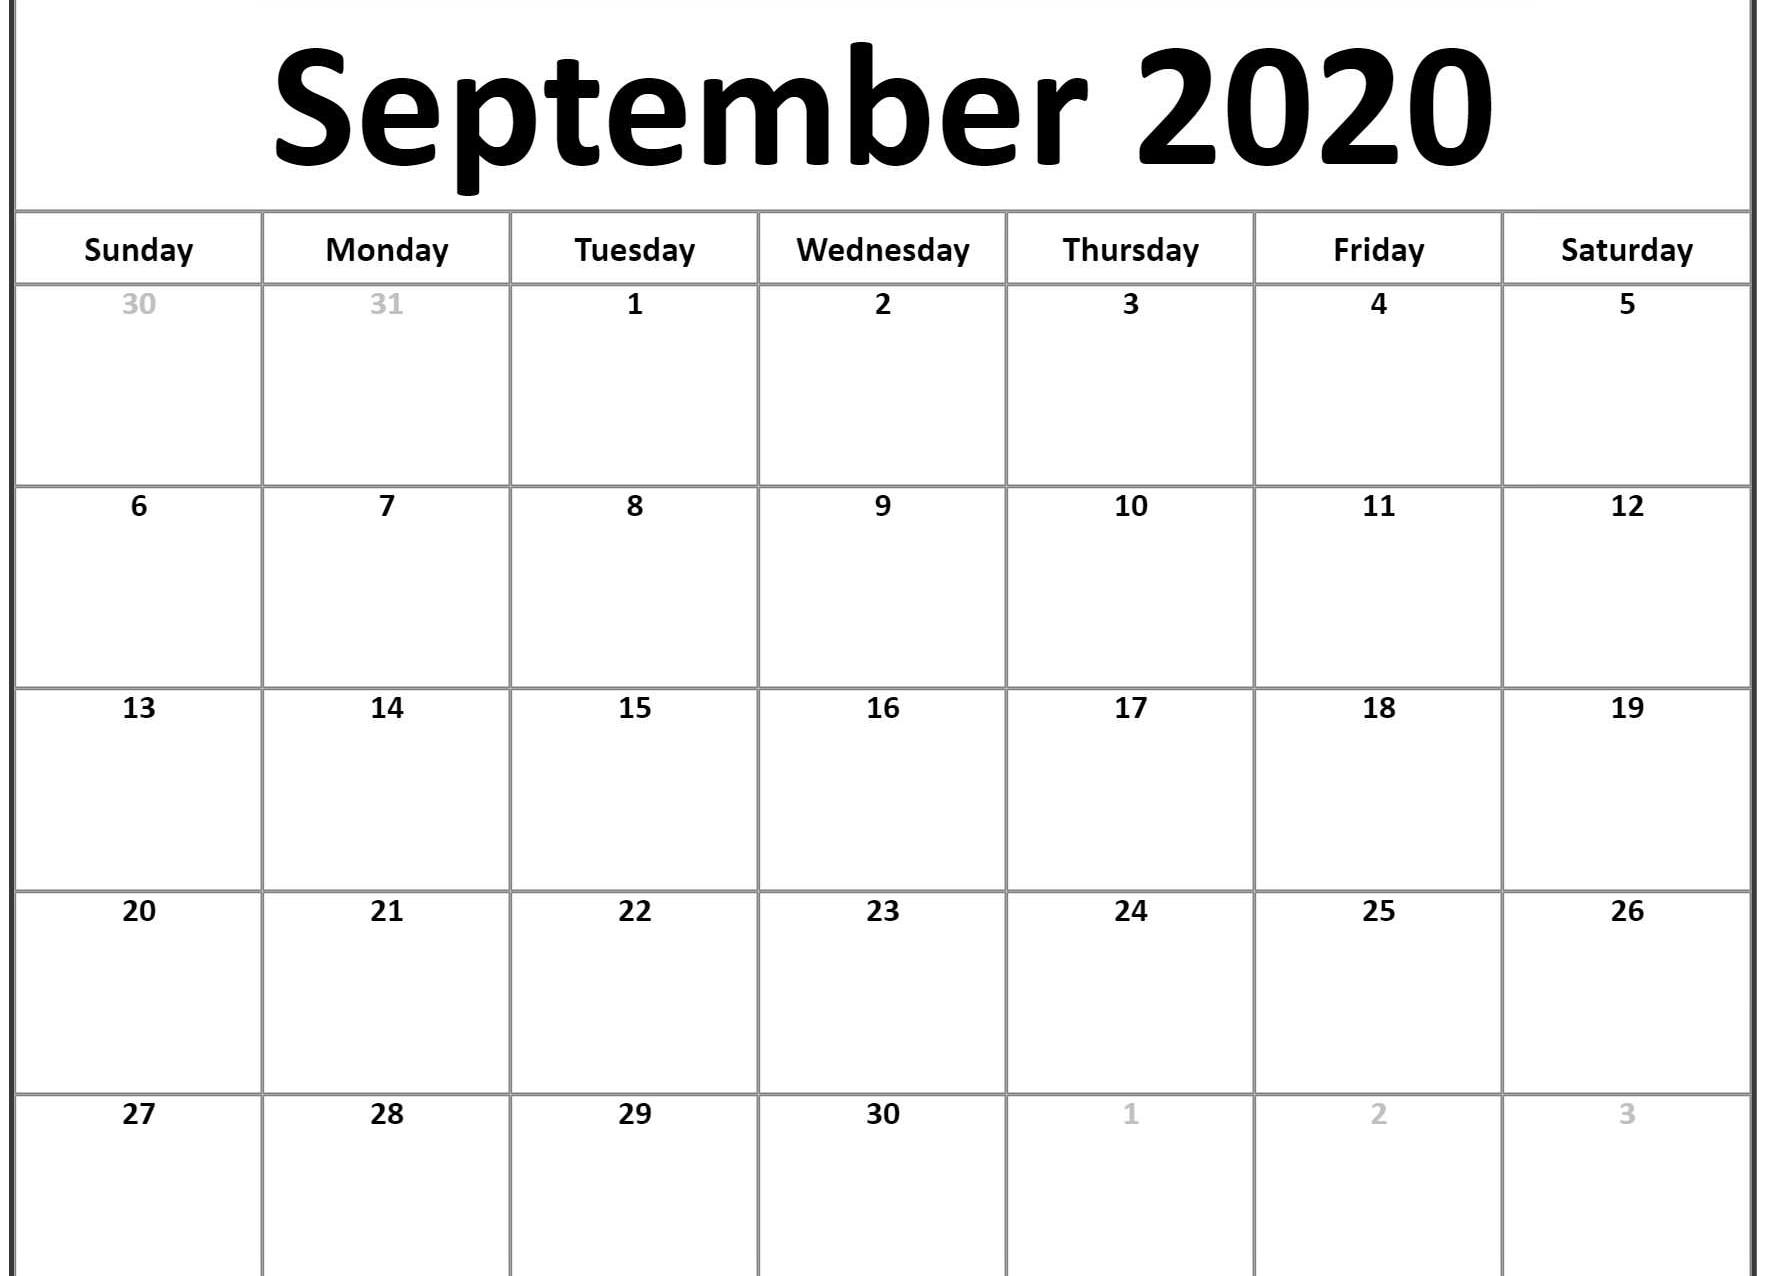 September 2020 Calendar Template Word, Pdf, Excel Format